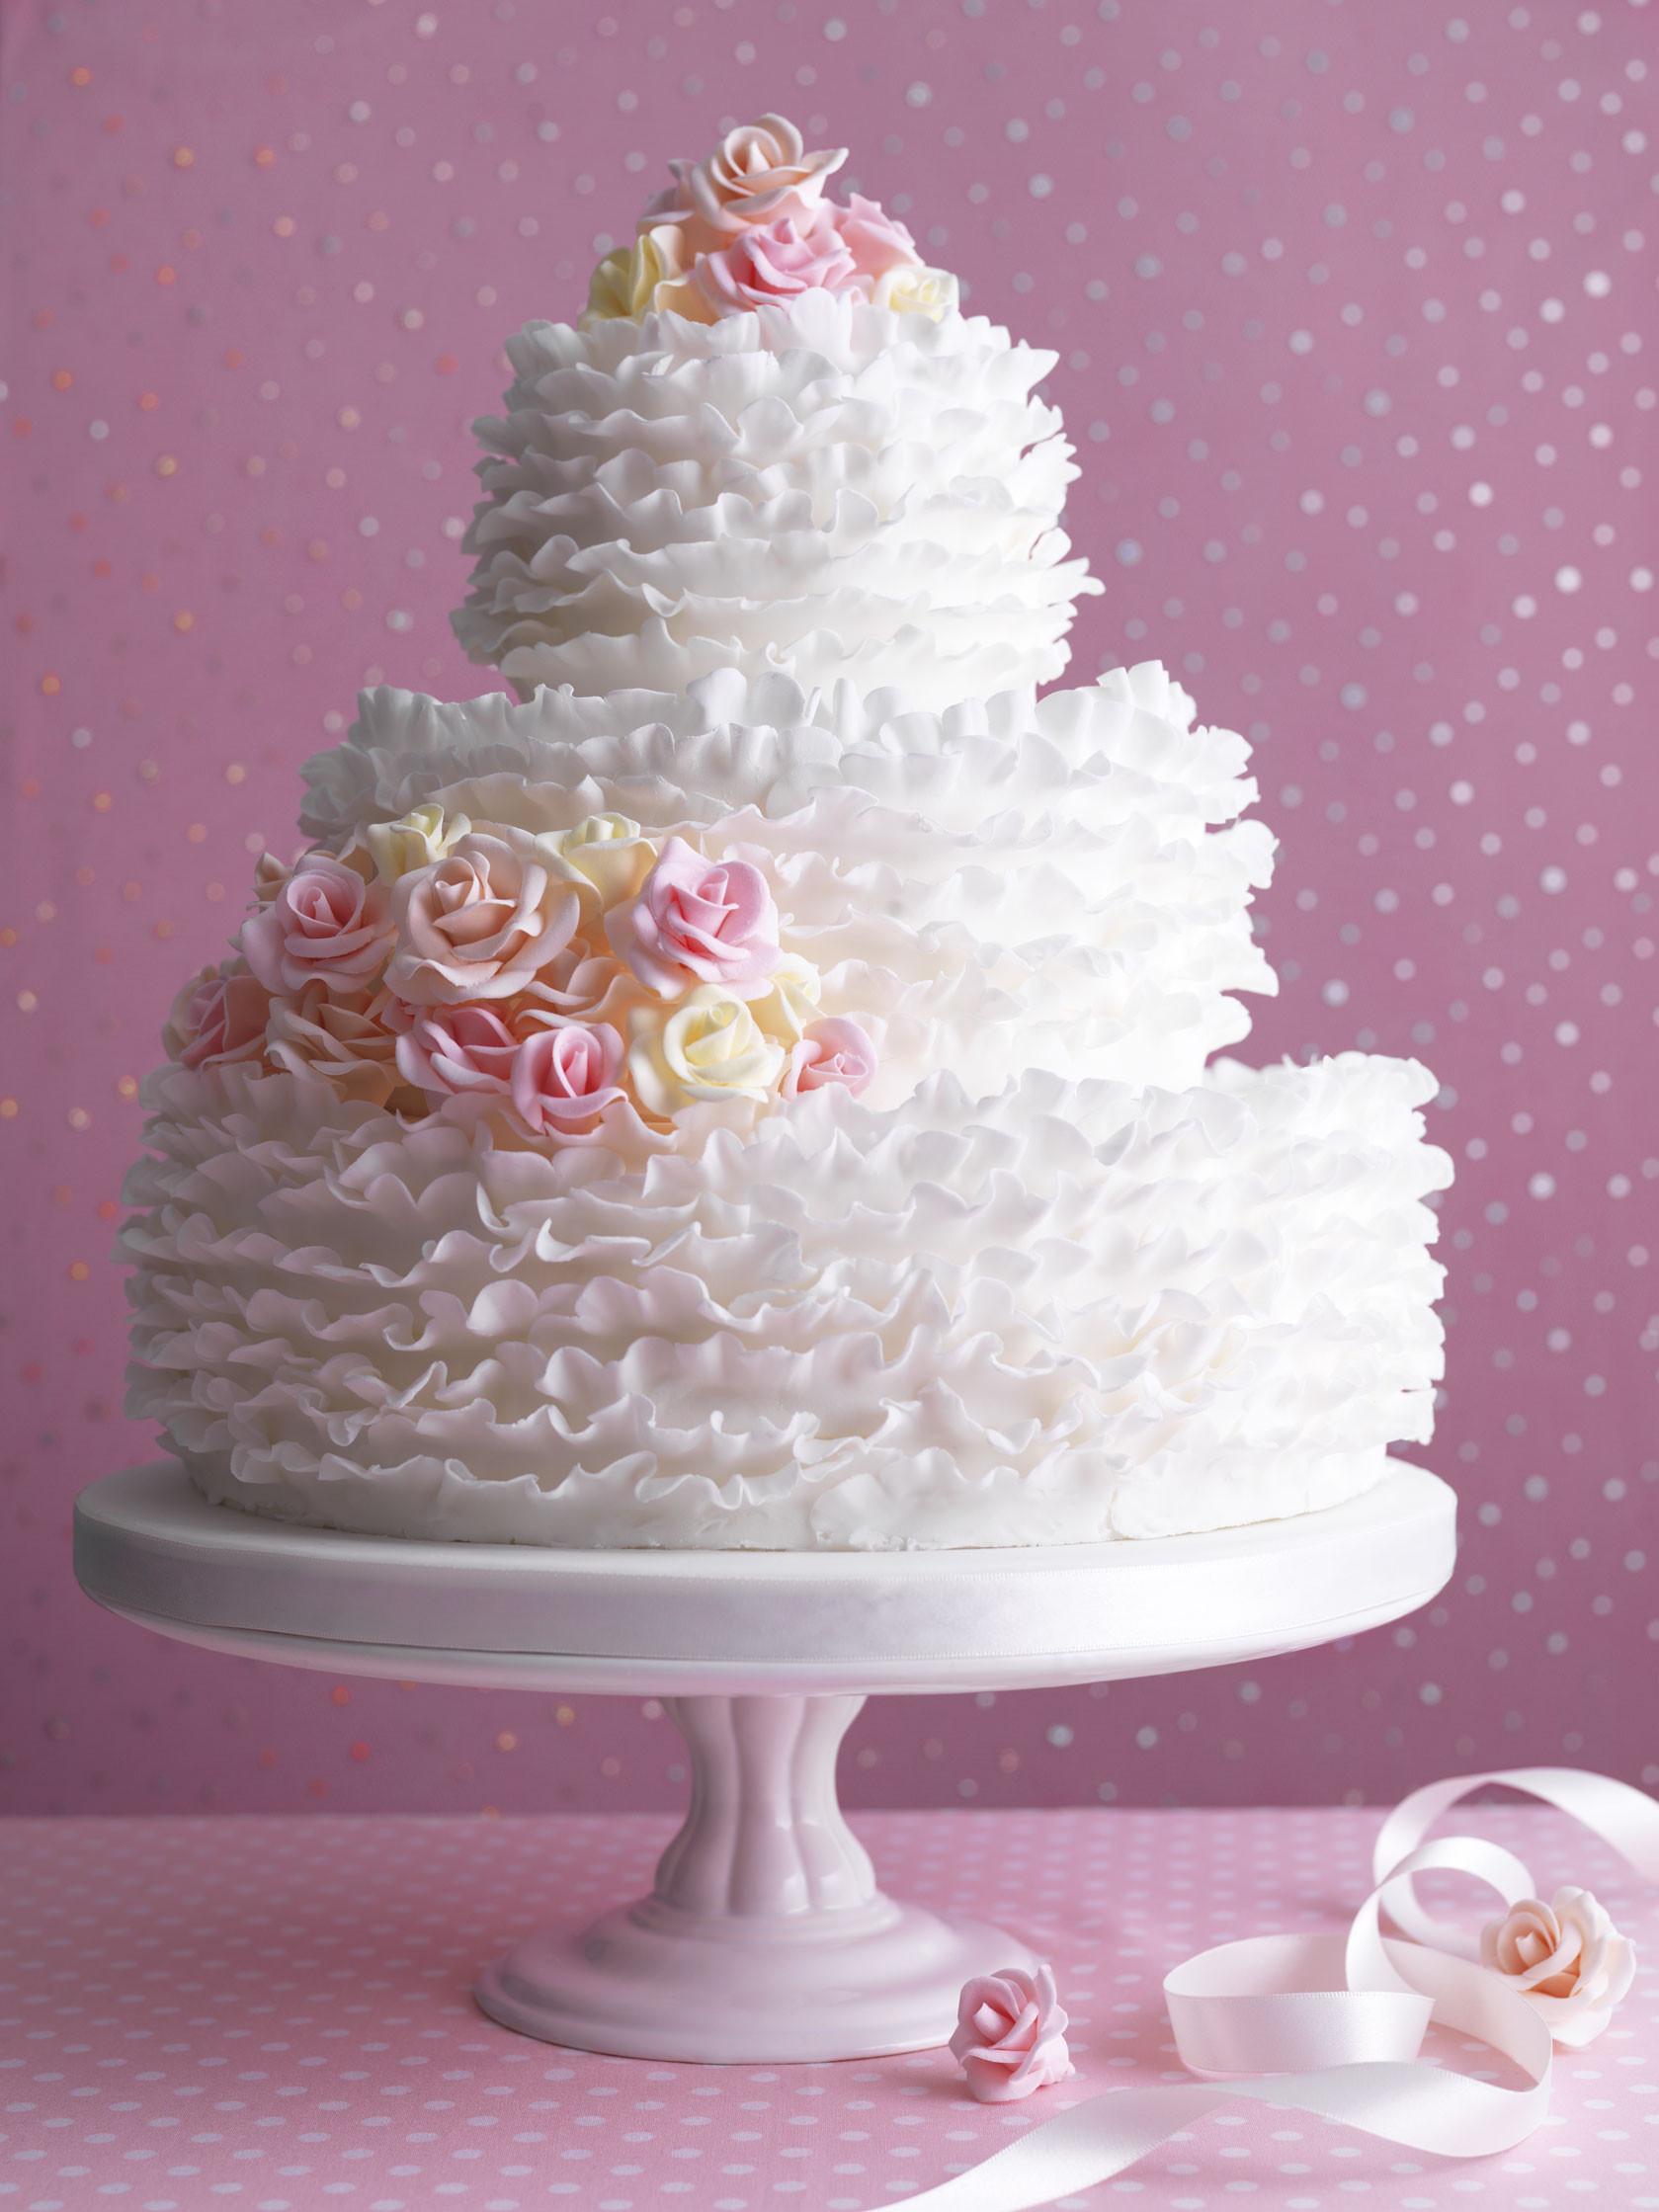 Who Makes Wedding Cakes  How to make a wedding cake